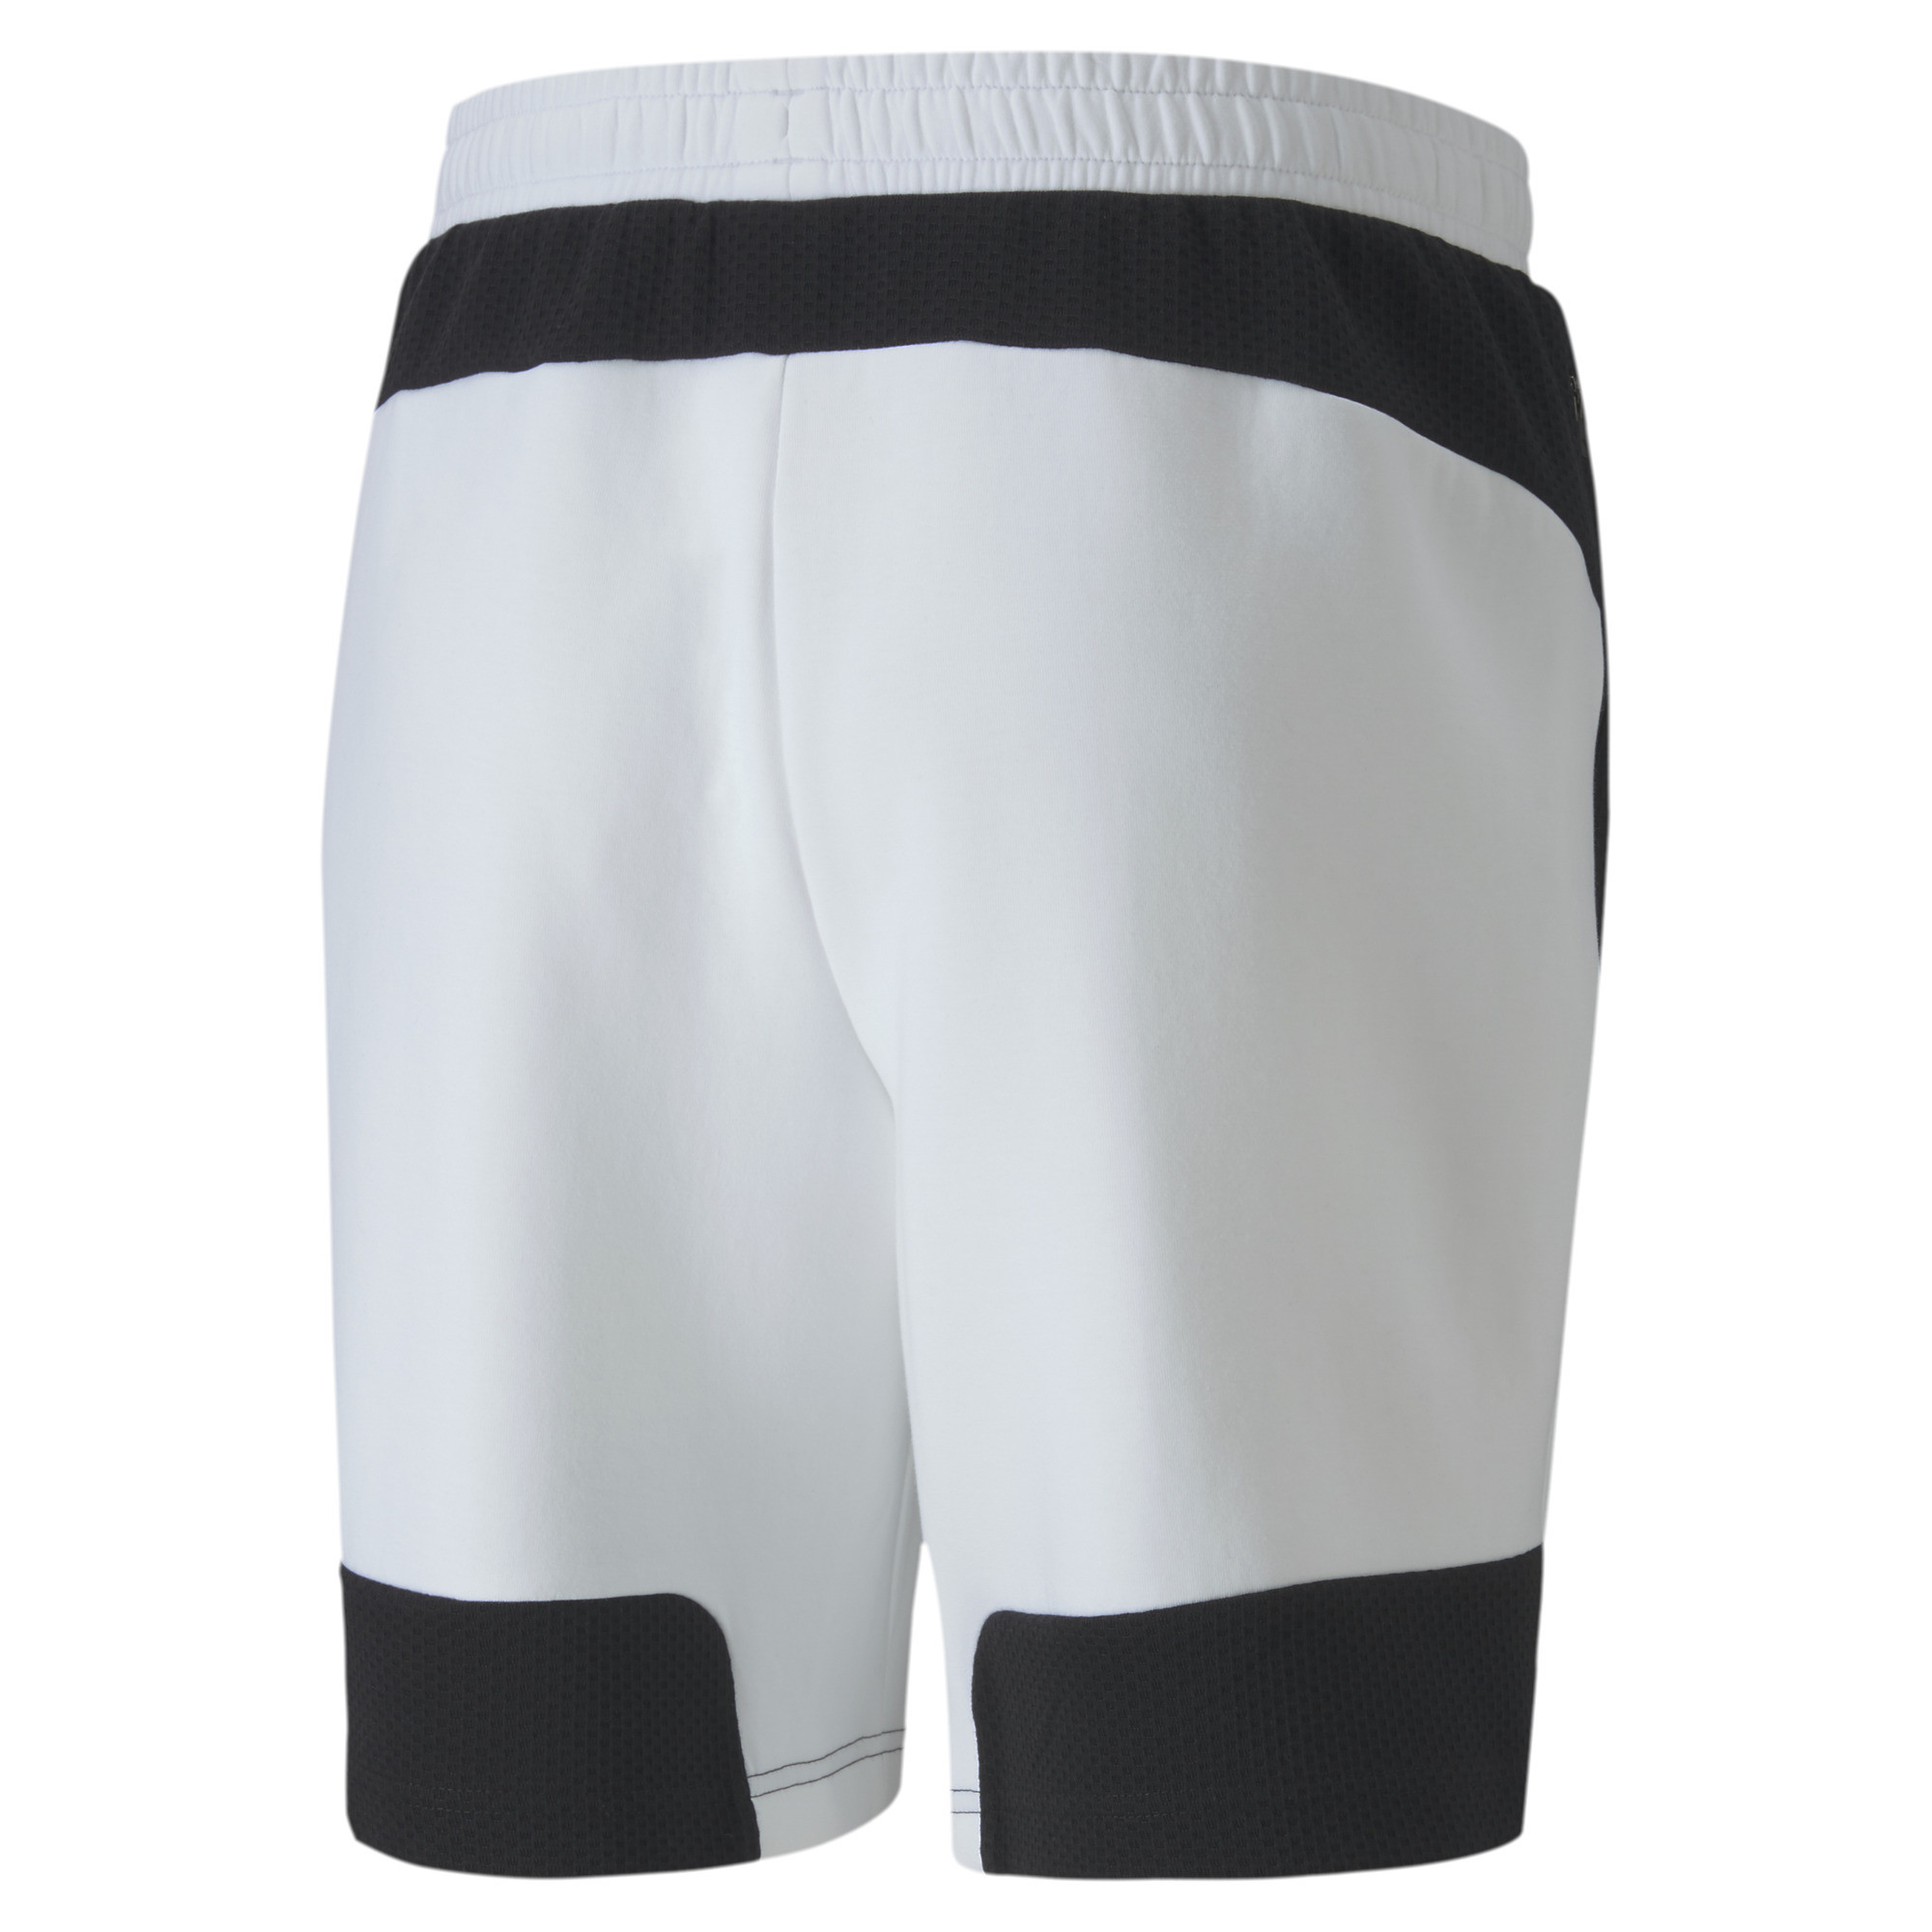 PUMA-Evostripe-Men-039-s-Shorts-Men-Knitted-Shorts-Basics thumbnail 19